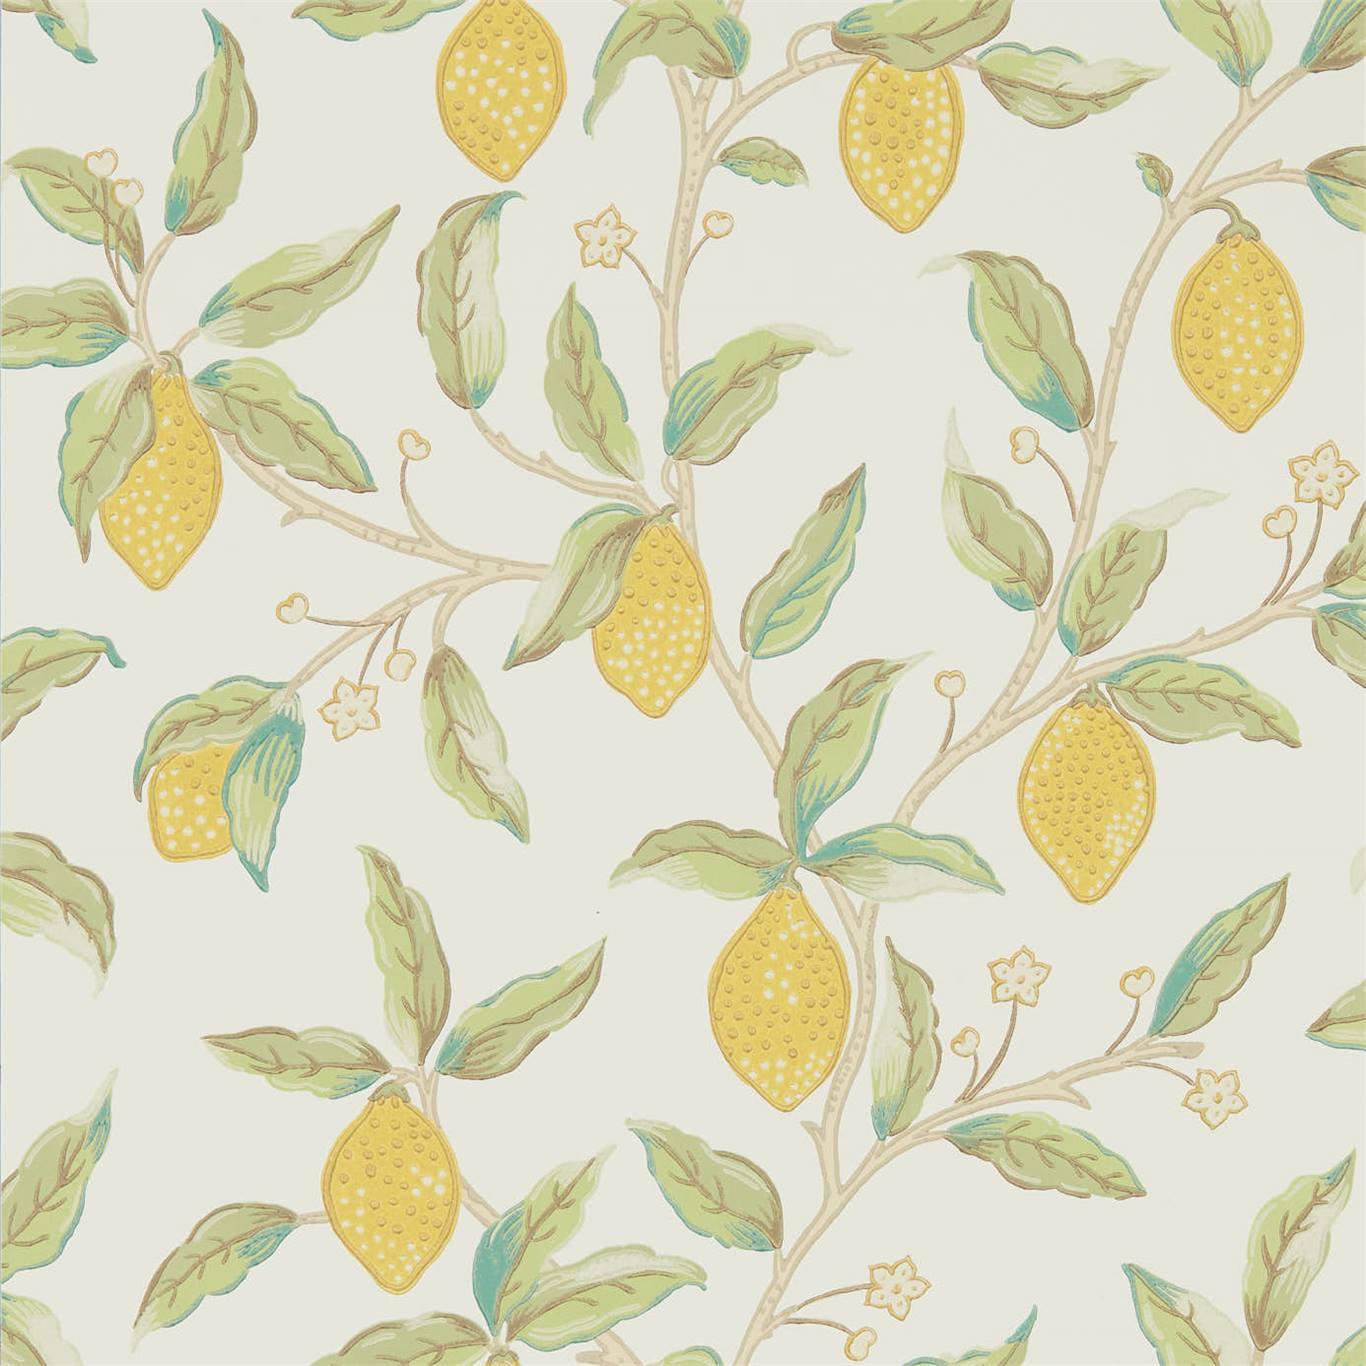 Lemon Tree wallpaper by Morris & Co.